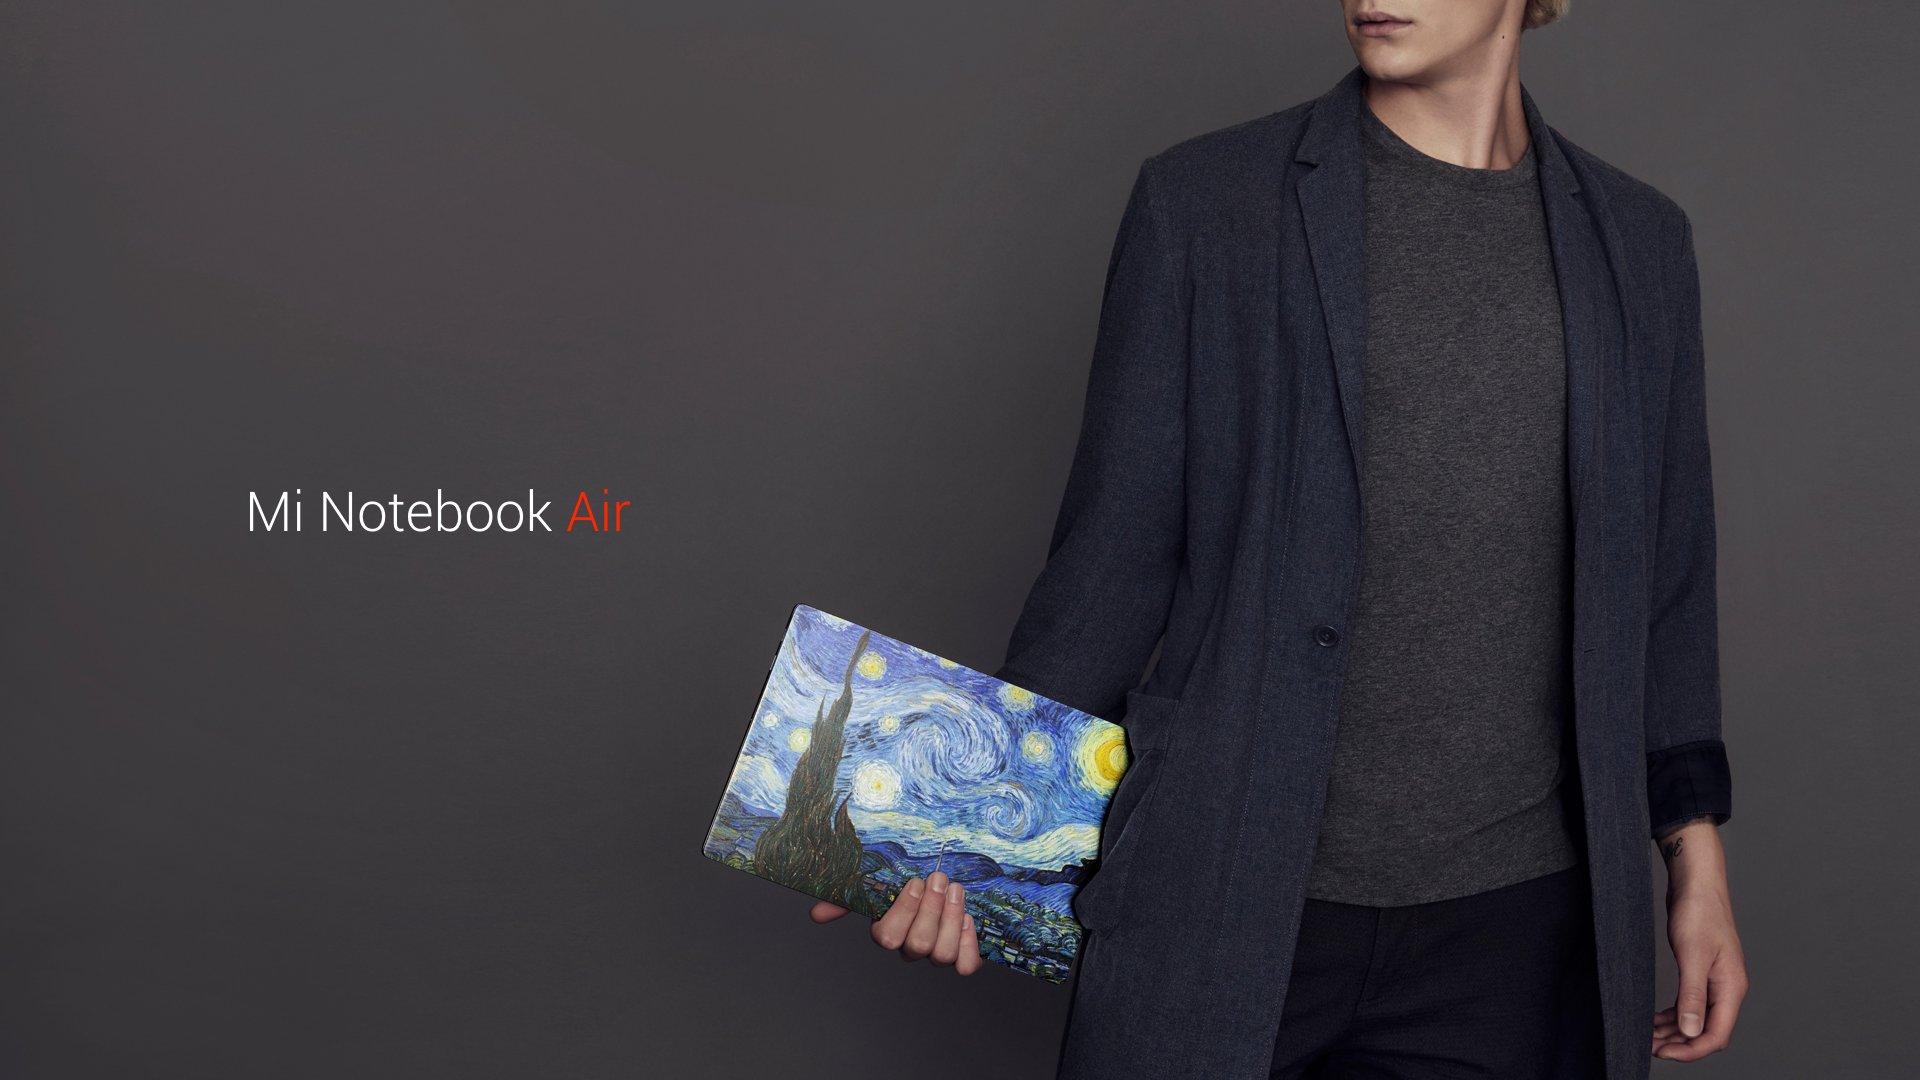 Xiaomi unveils the Mi Notebook Air, its Macbook Air killer 8